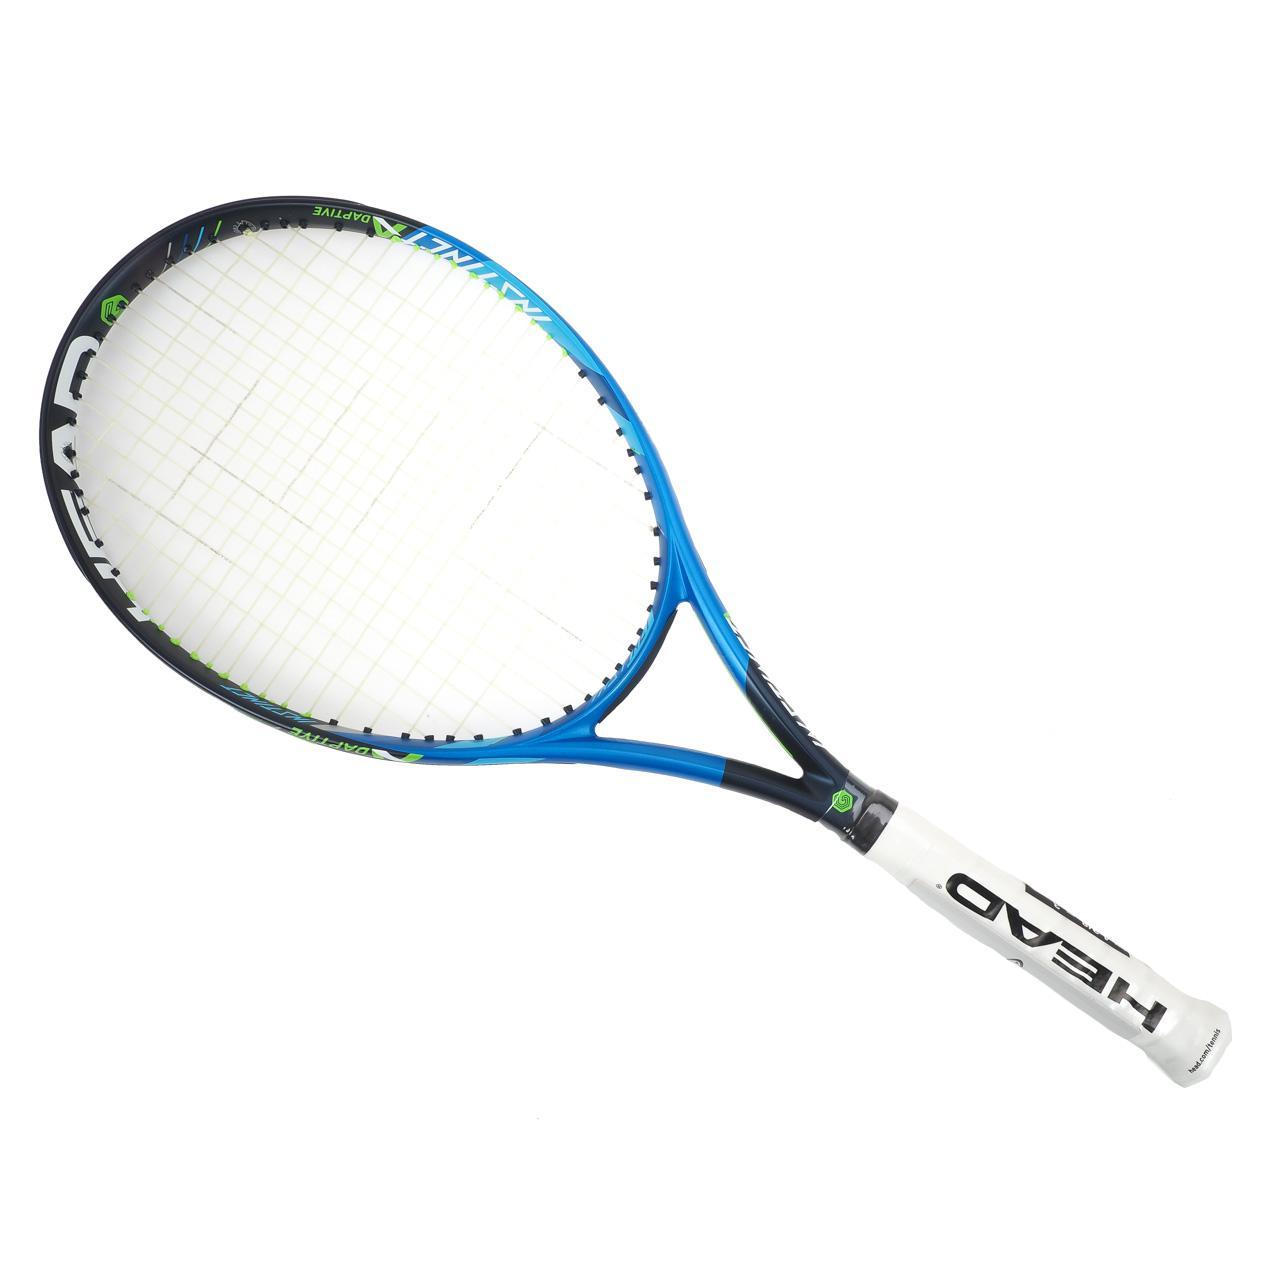 Tennis-Racket-Head-Graphen-Touch-Instinct-ad-Blue-70201-New